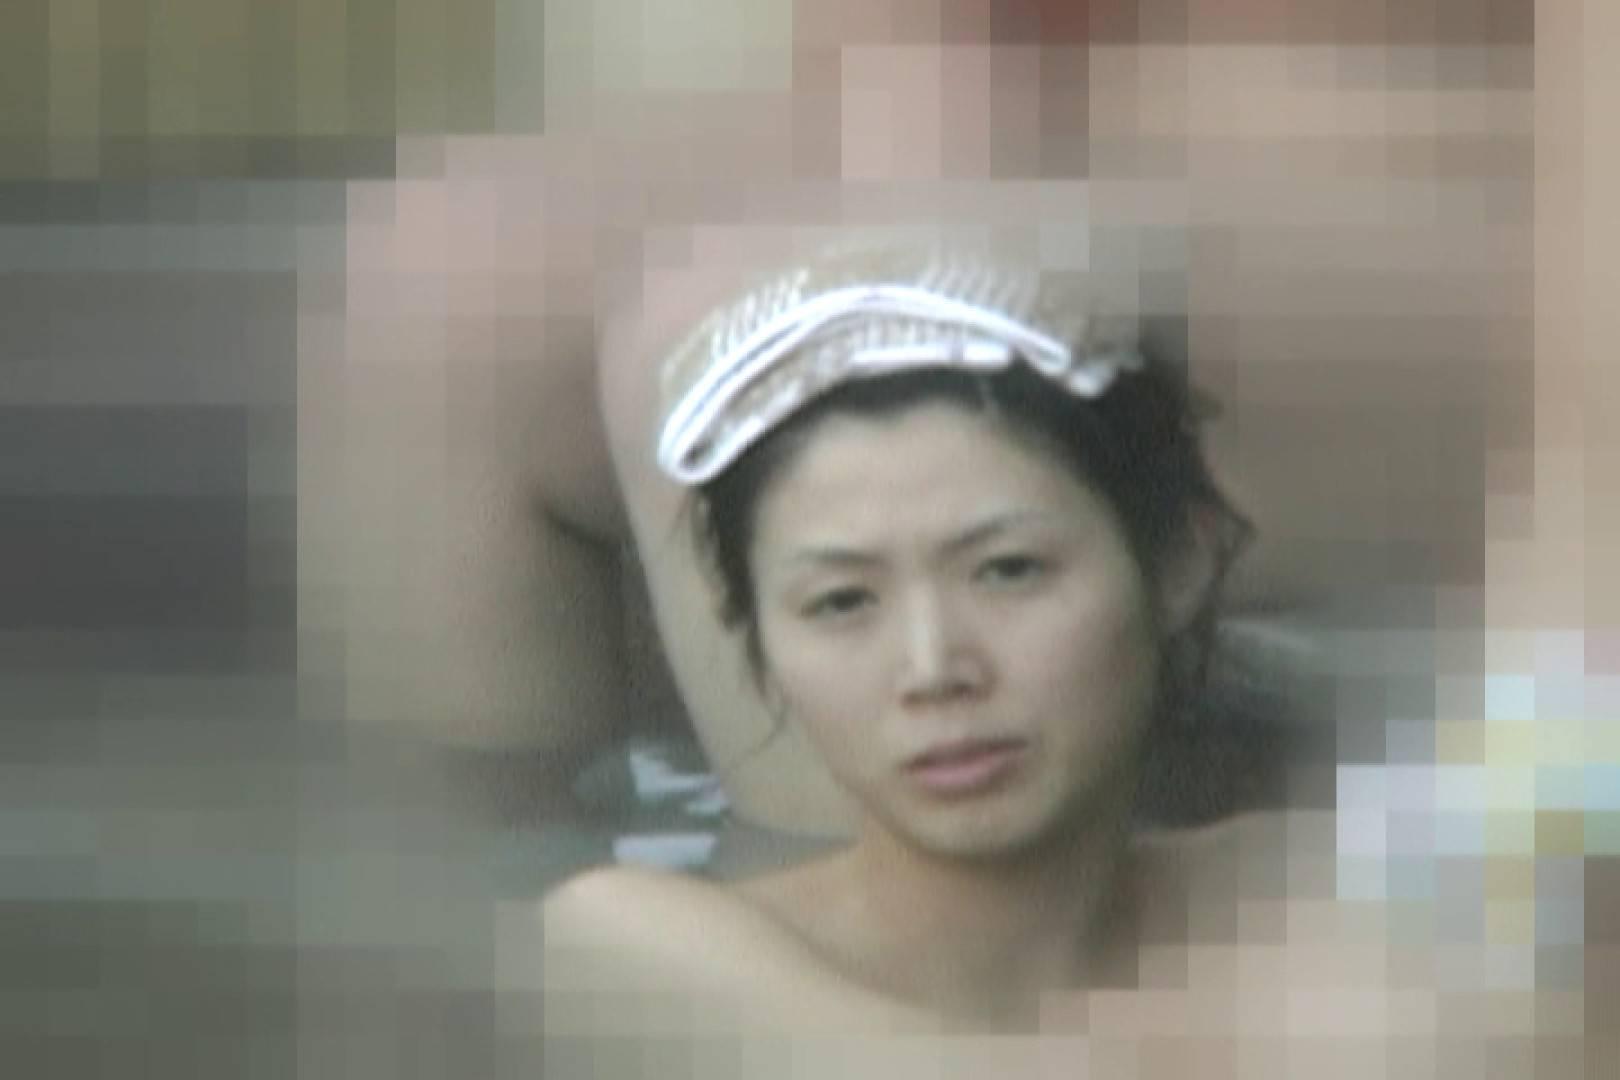 Aquaな露天風呂Vol.856 OLのエロ生活 SEX無修正画像 74連発 41